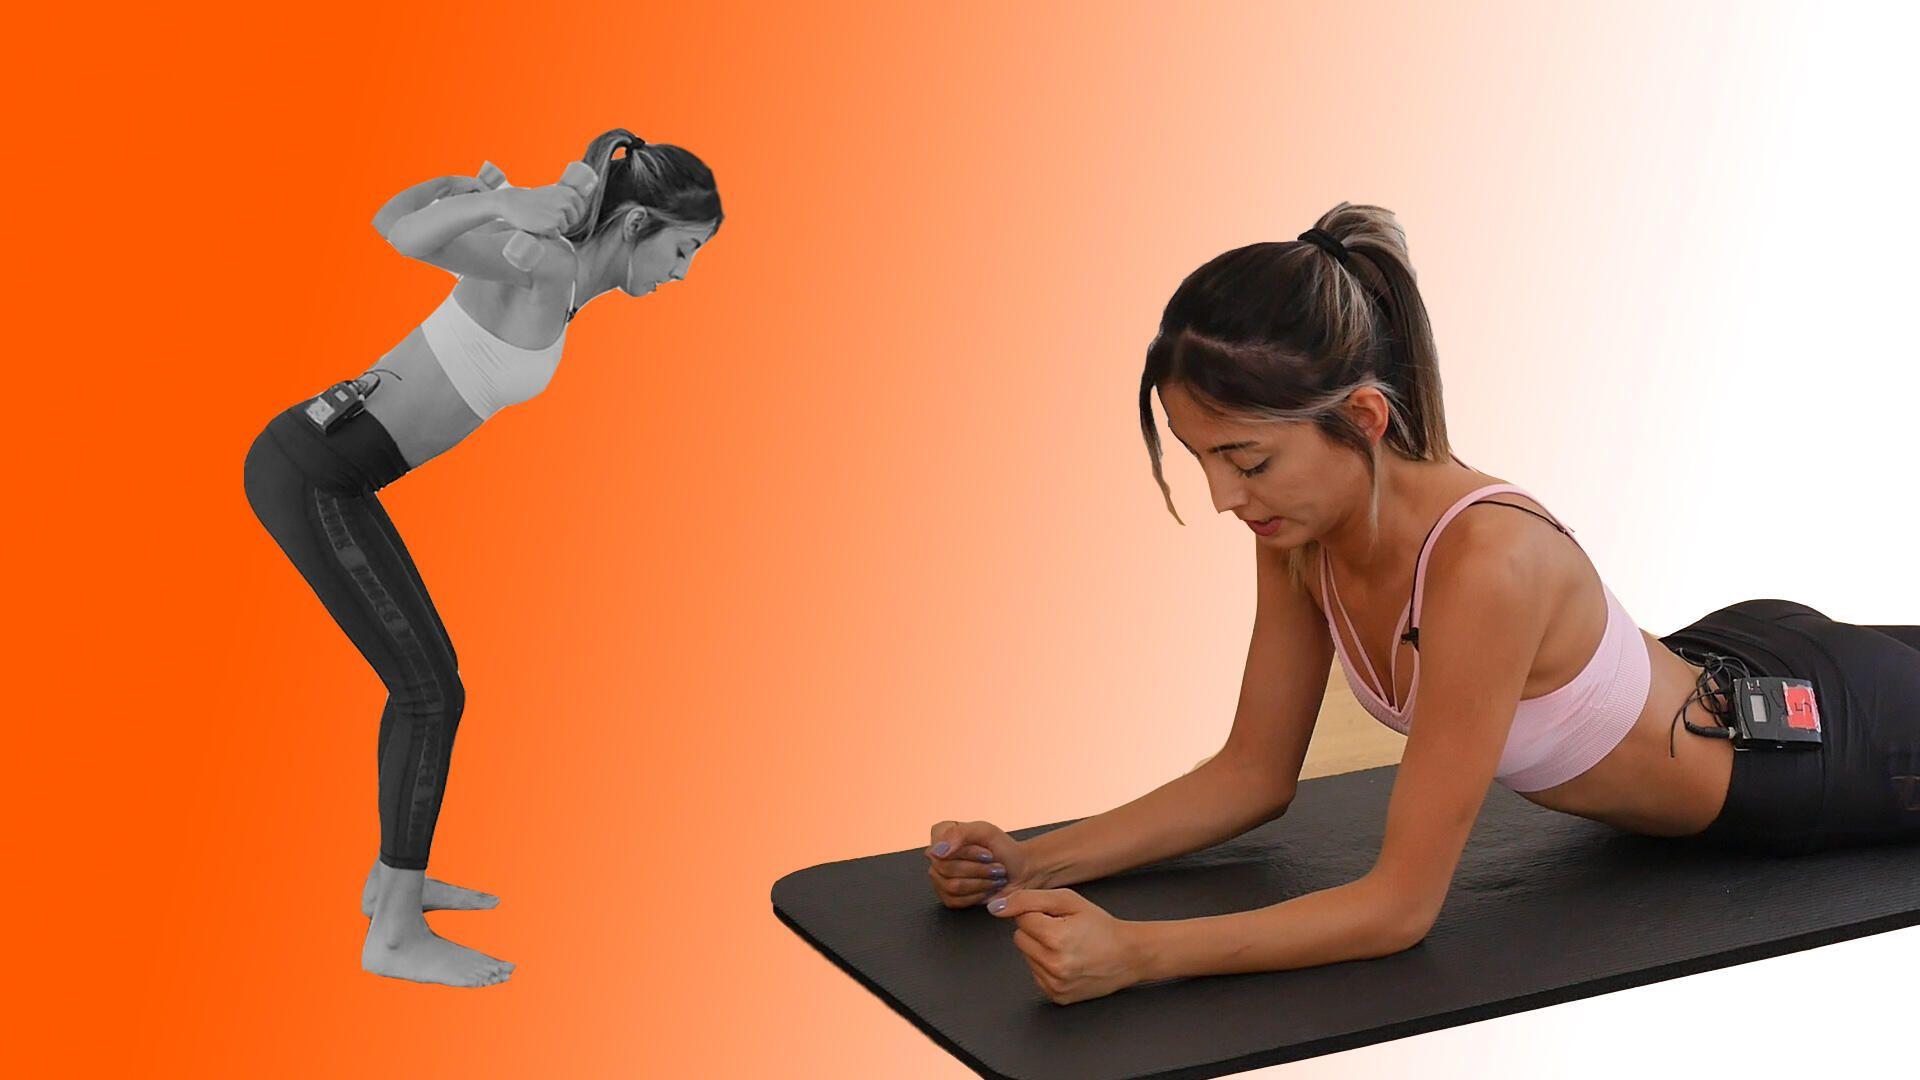 Bel Agrilari Icin Pratik Pilates Egzersizleri Hurriyet Video Pilates Egzersizleri Pilates Egzersiz